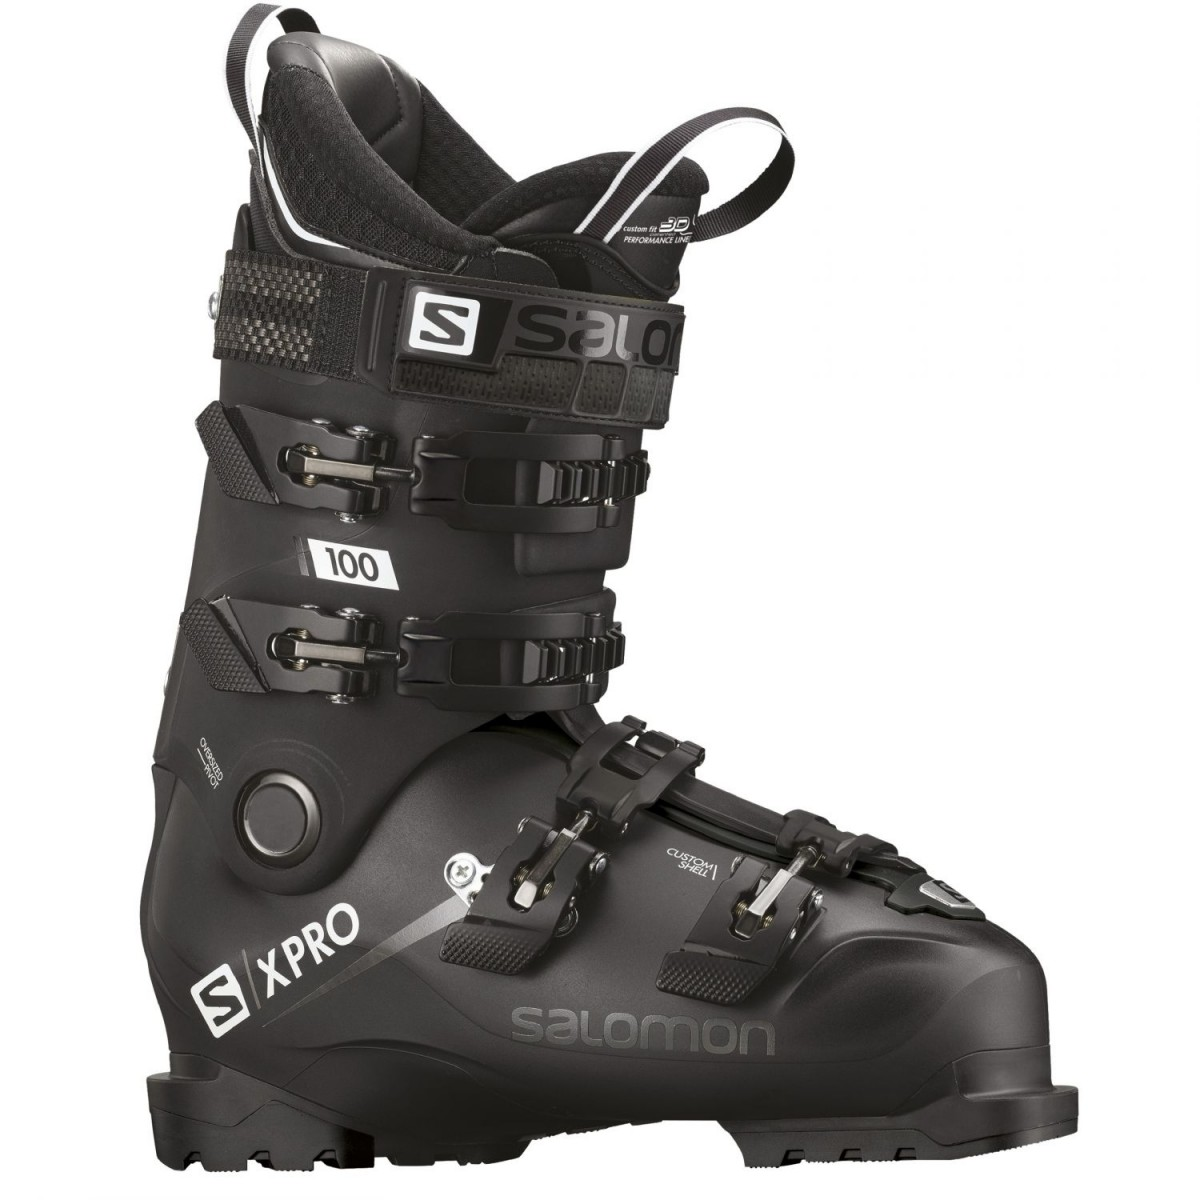 Salomon X Pro 100 Skischuhe